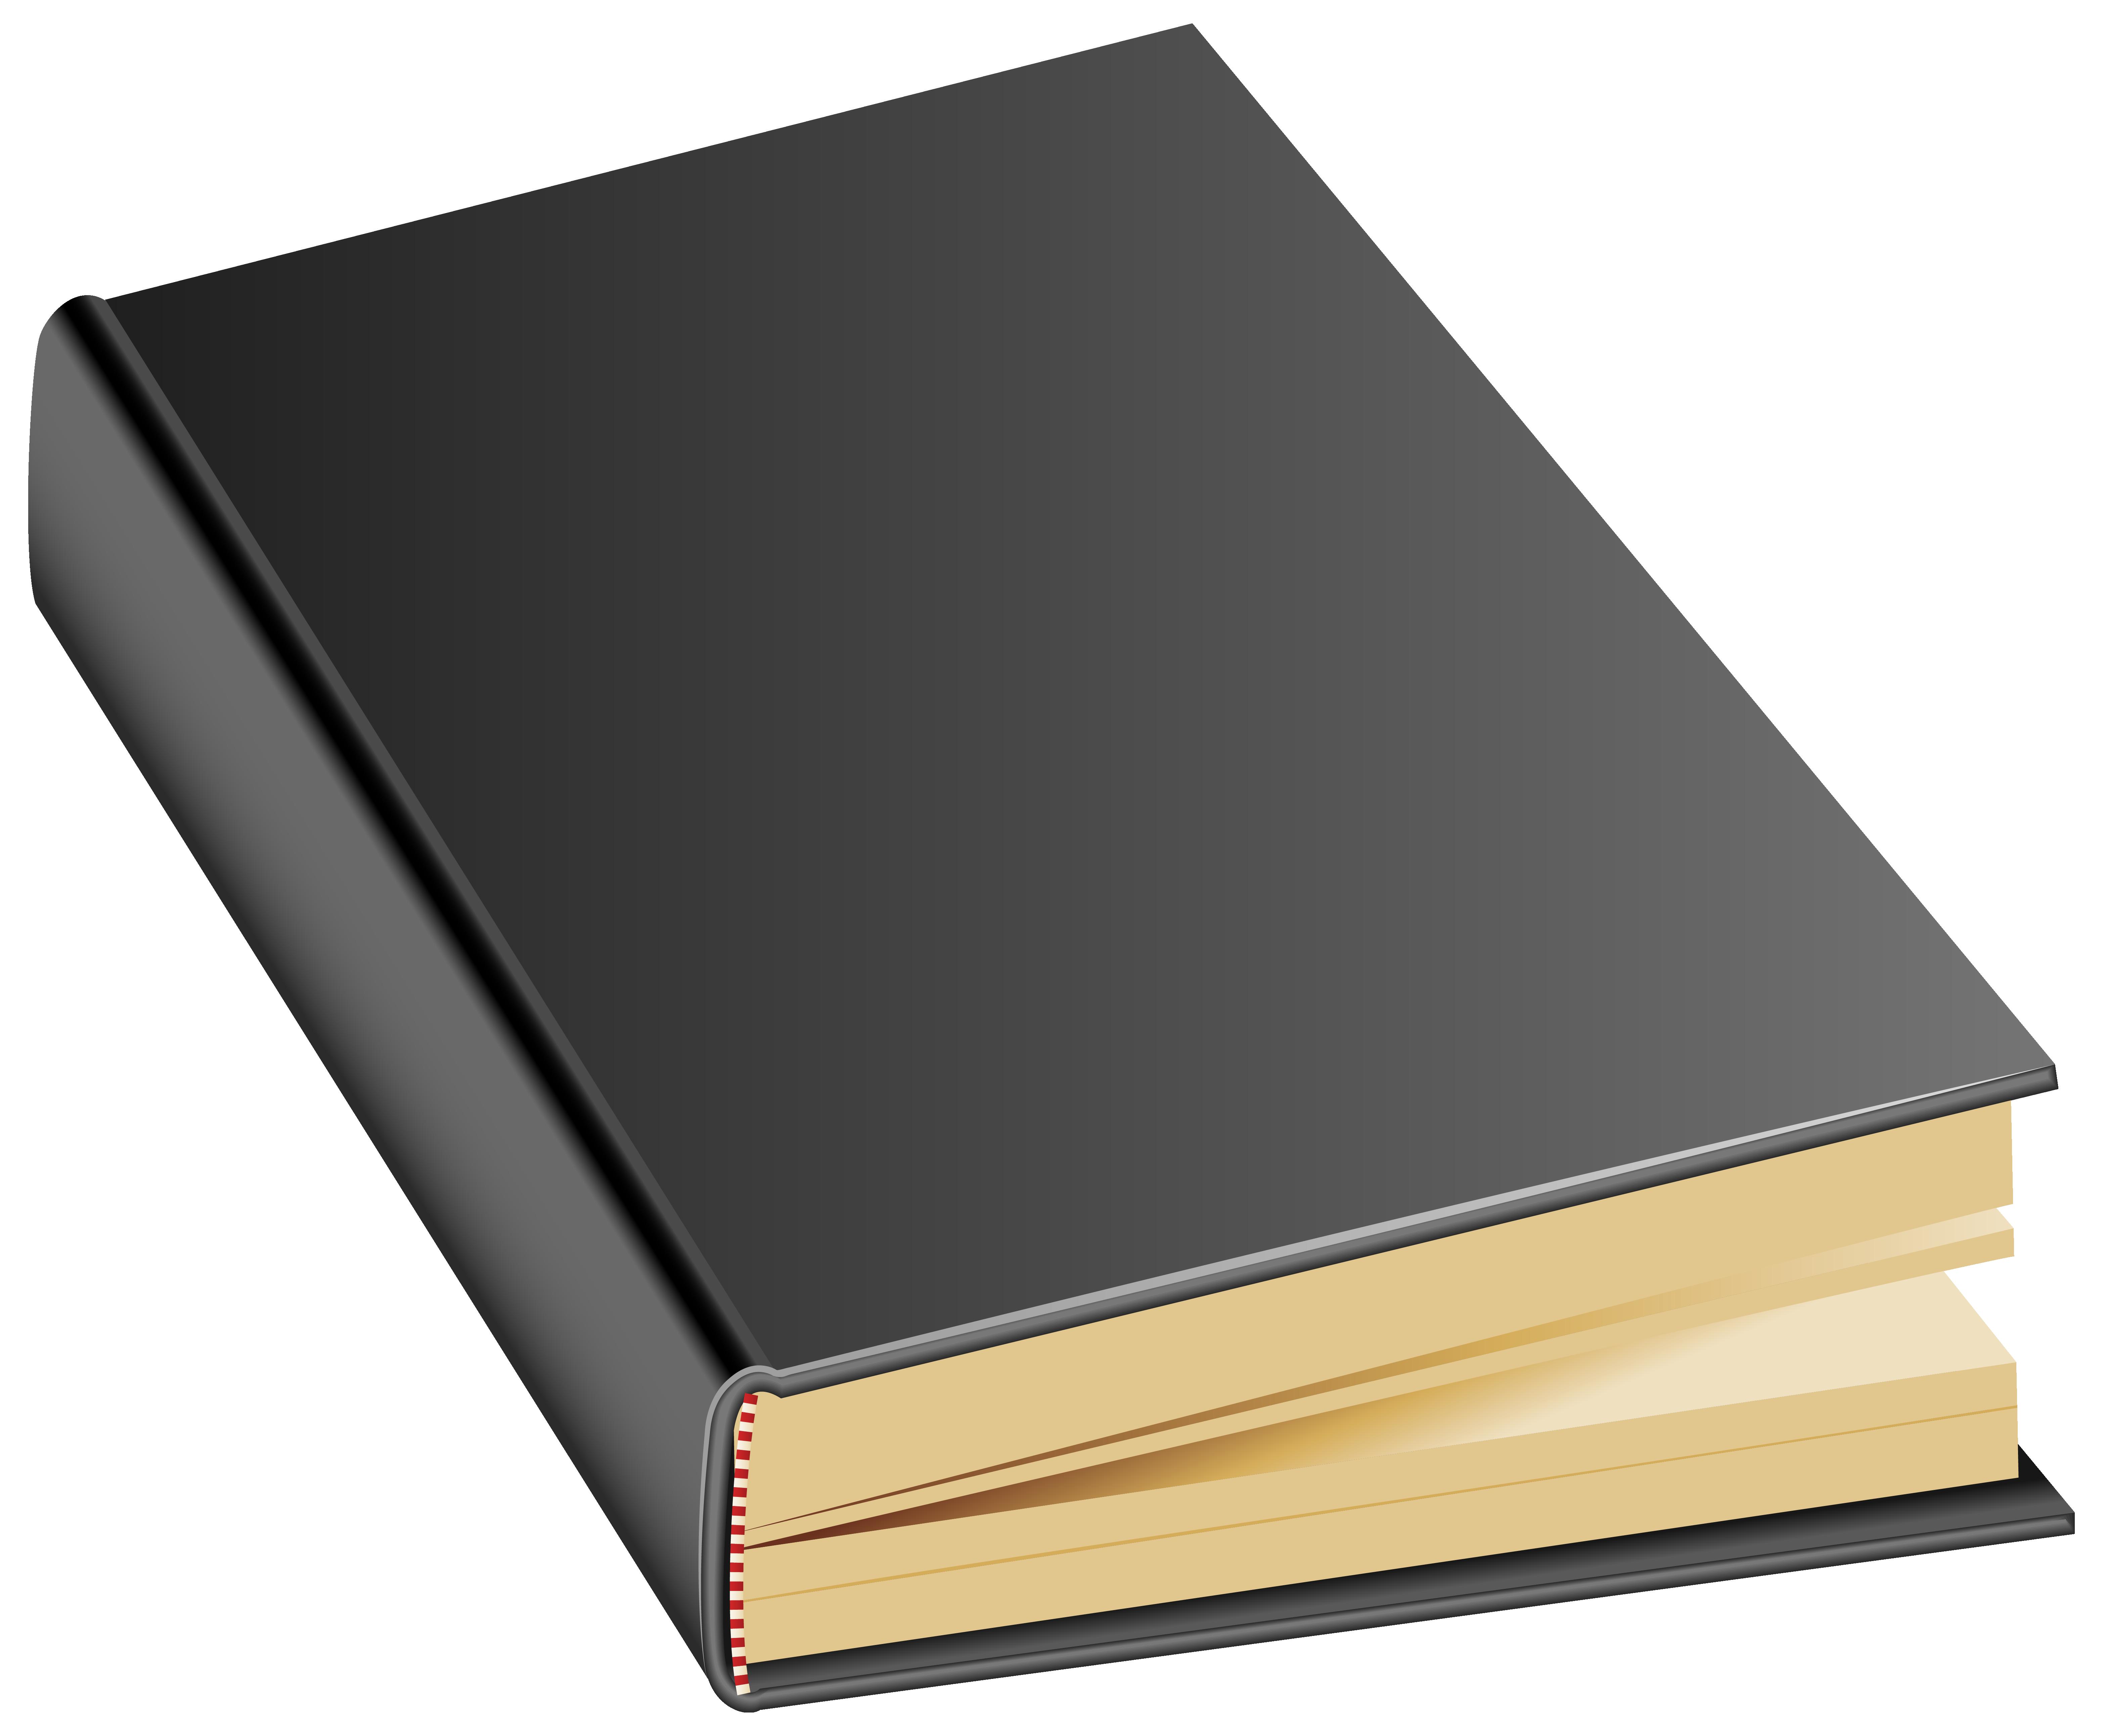 png transparent stock Books clipart rectangular. Black book png best